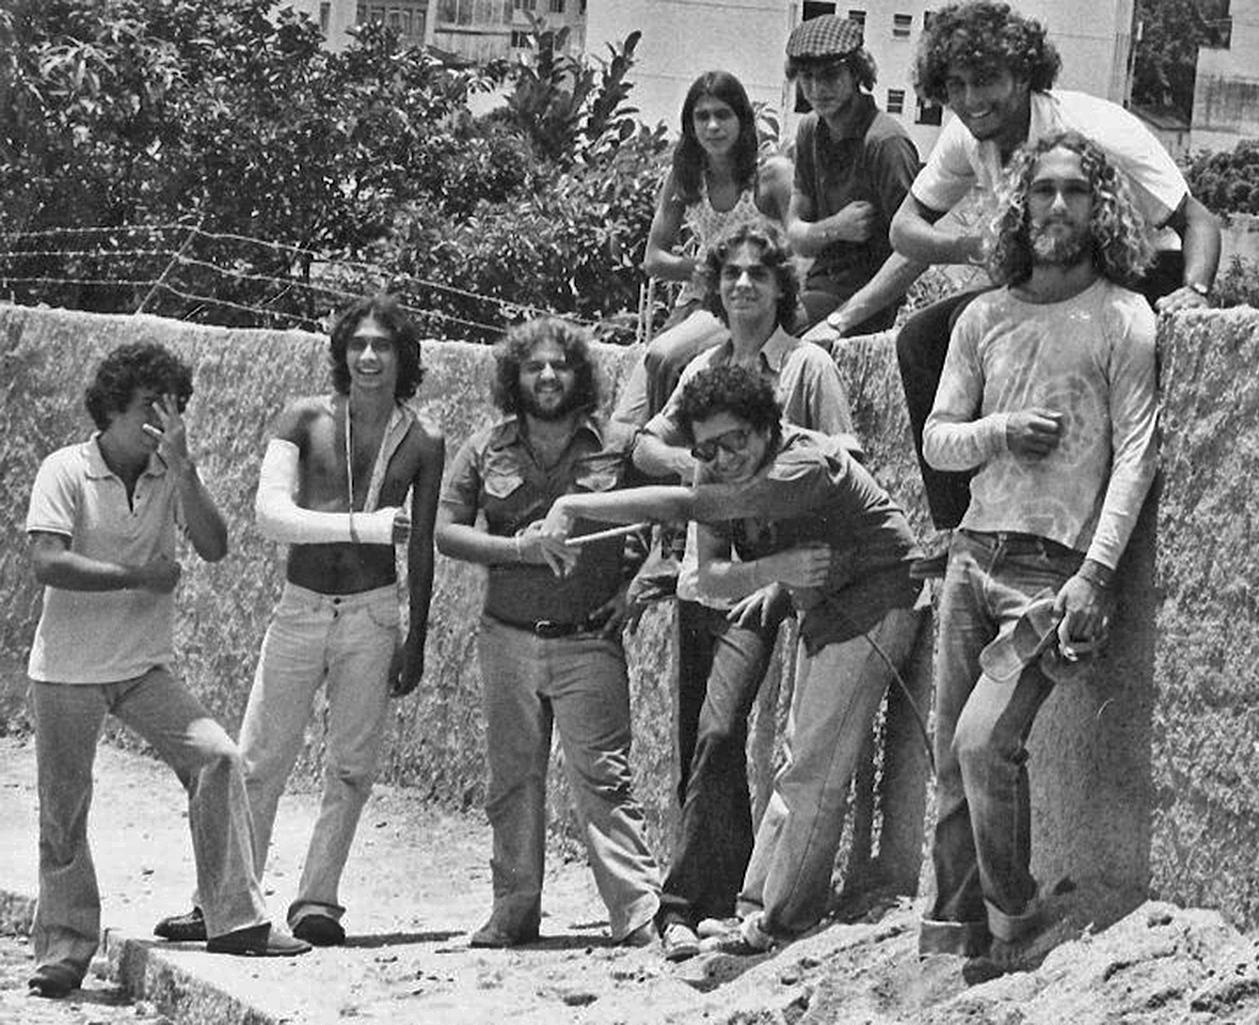 1970s musicians friends